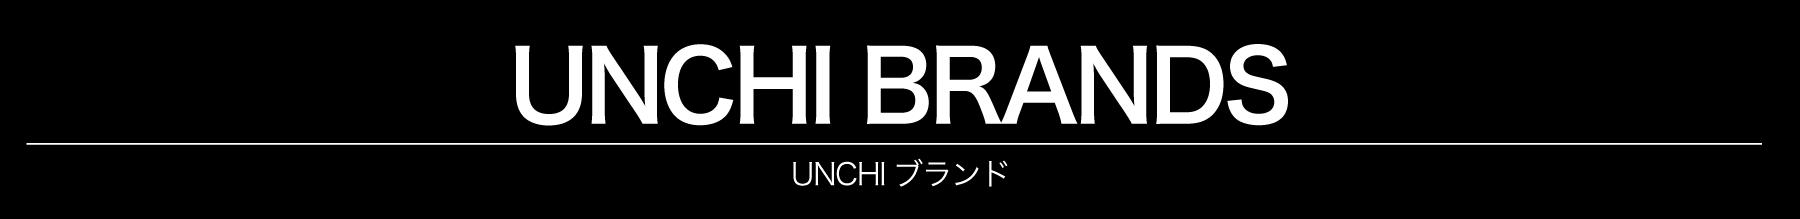 ti_brands